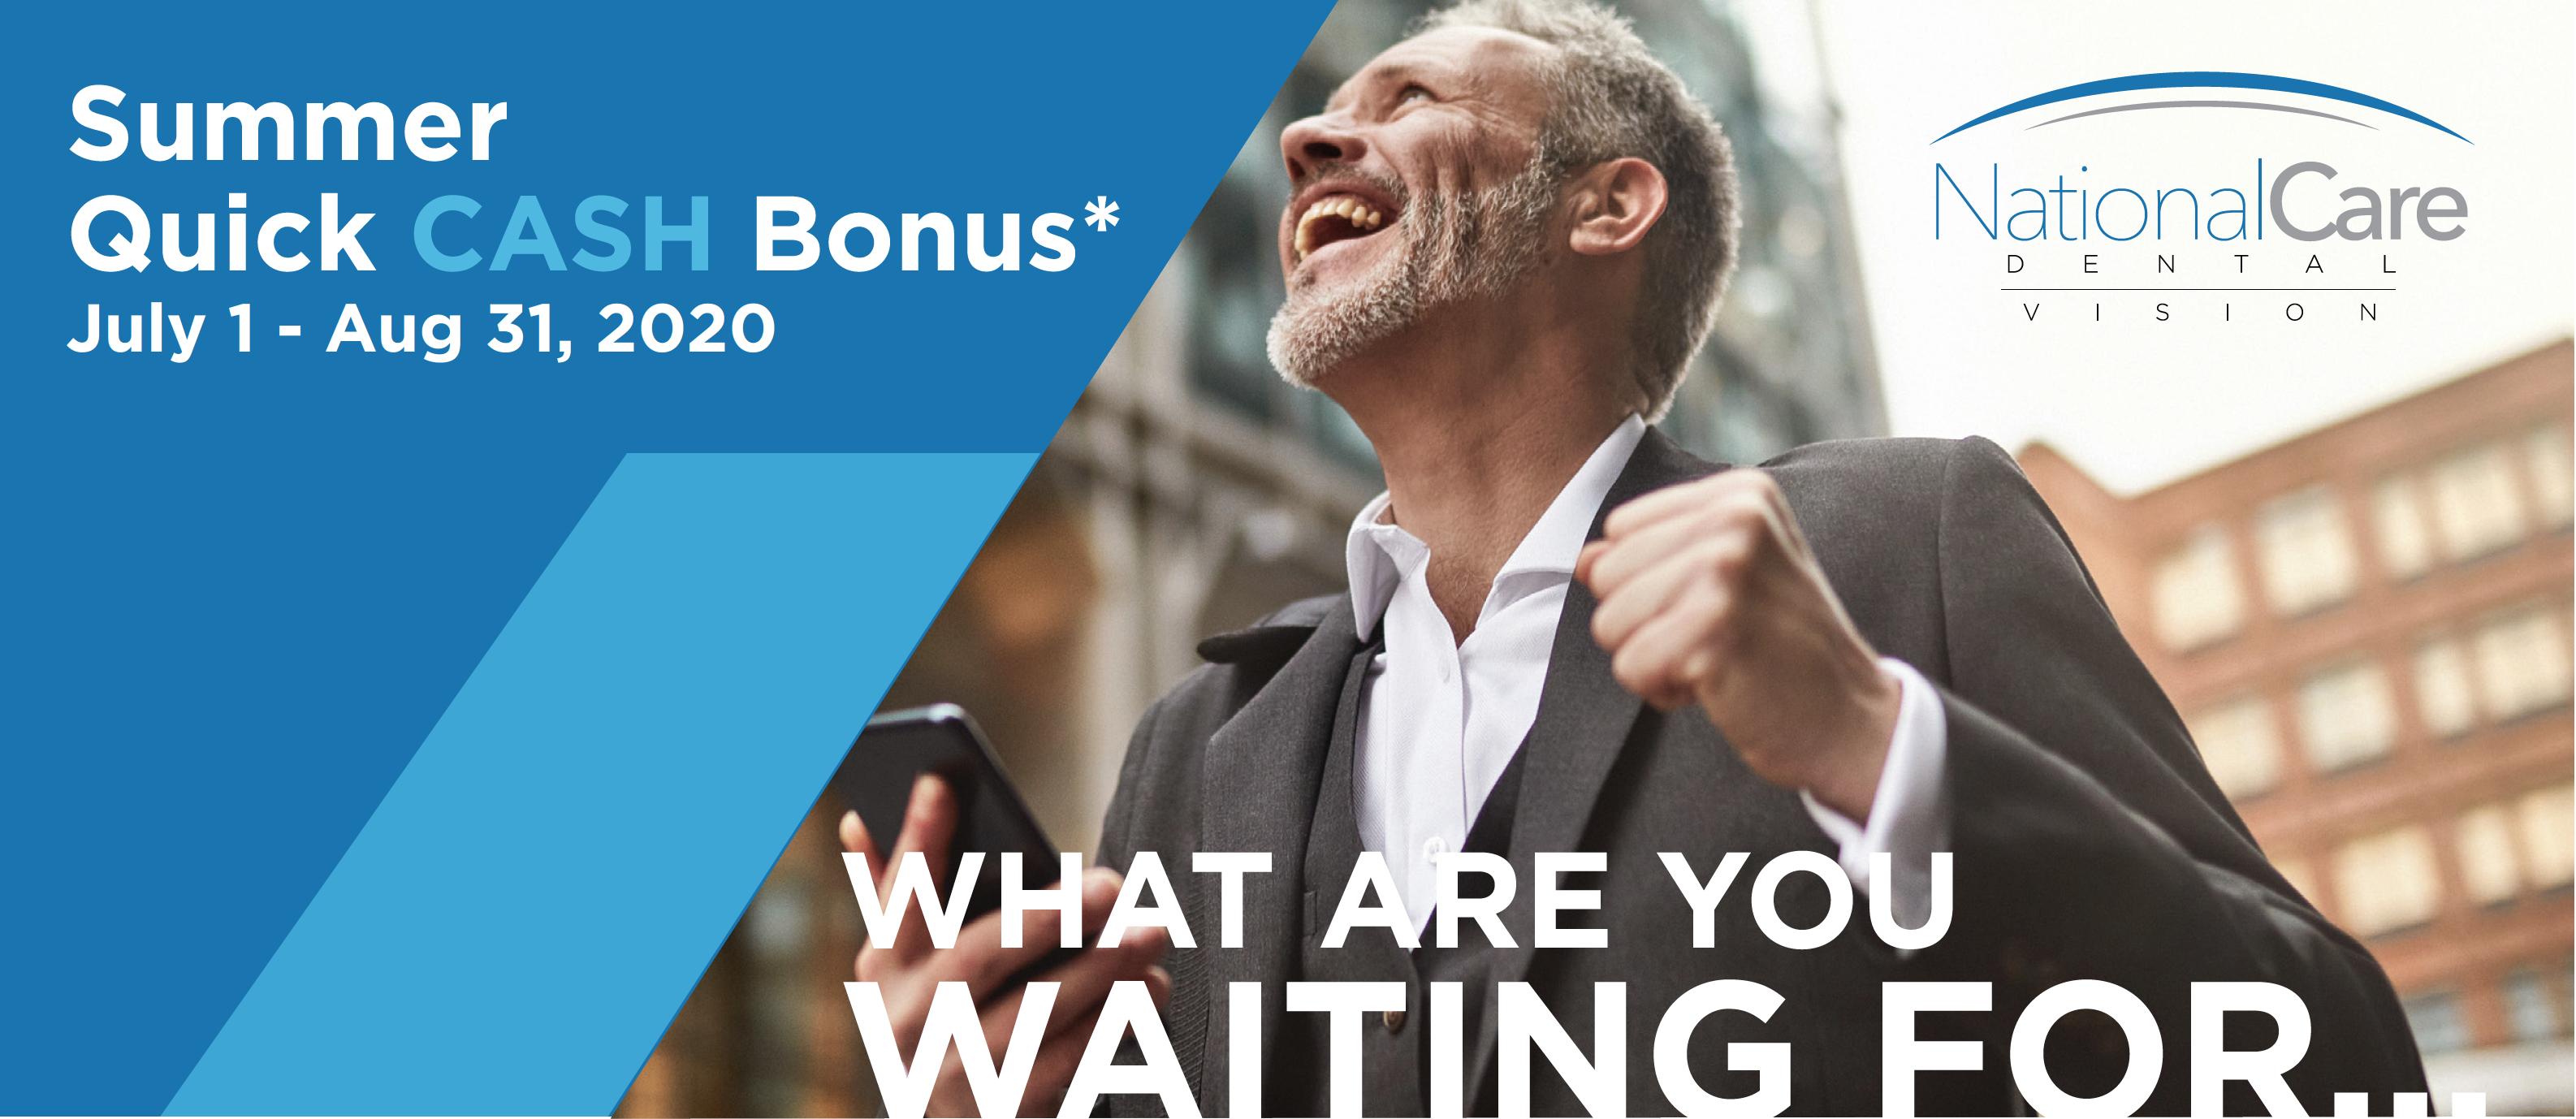 National Care Dental Summer Quick Cash Bonus–Up to $3,000 Bonus!